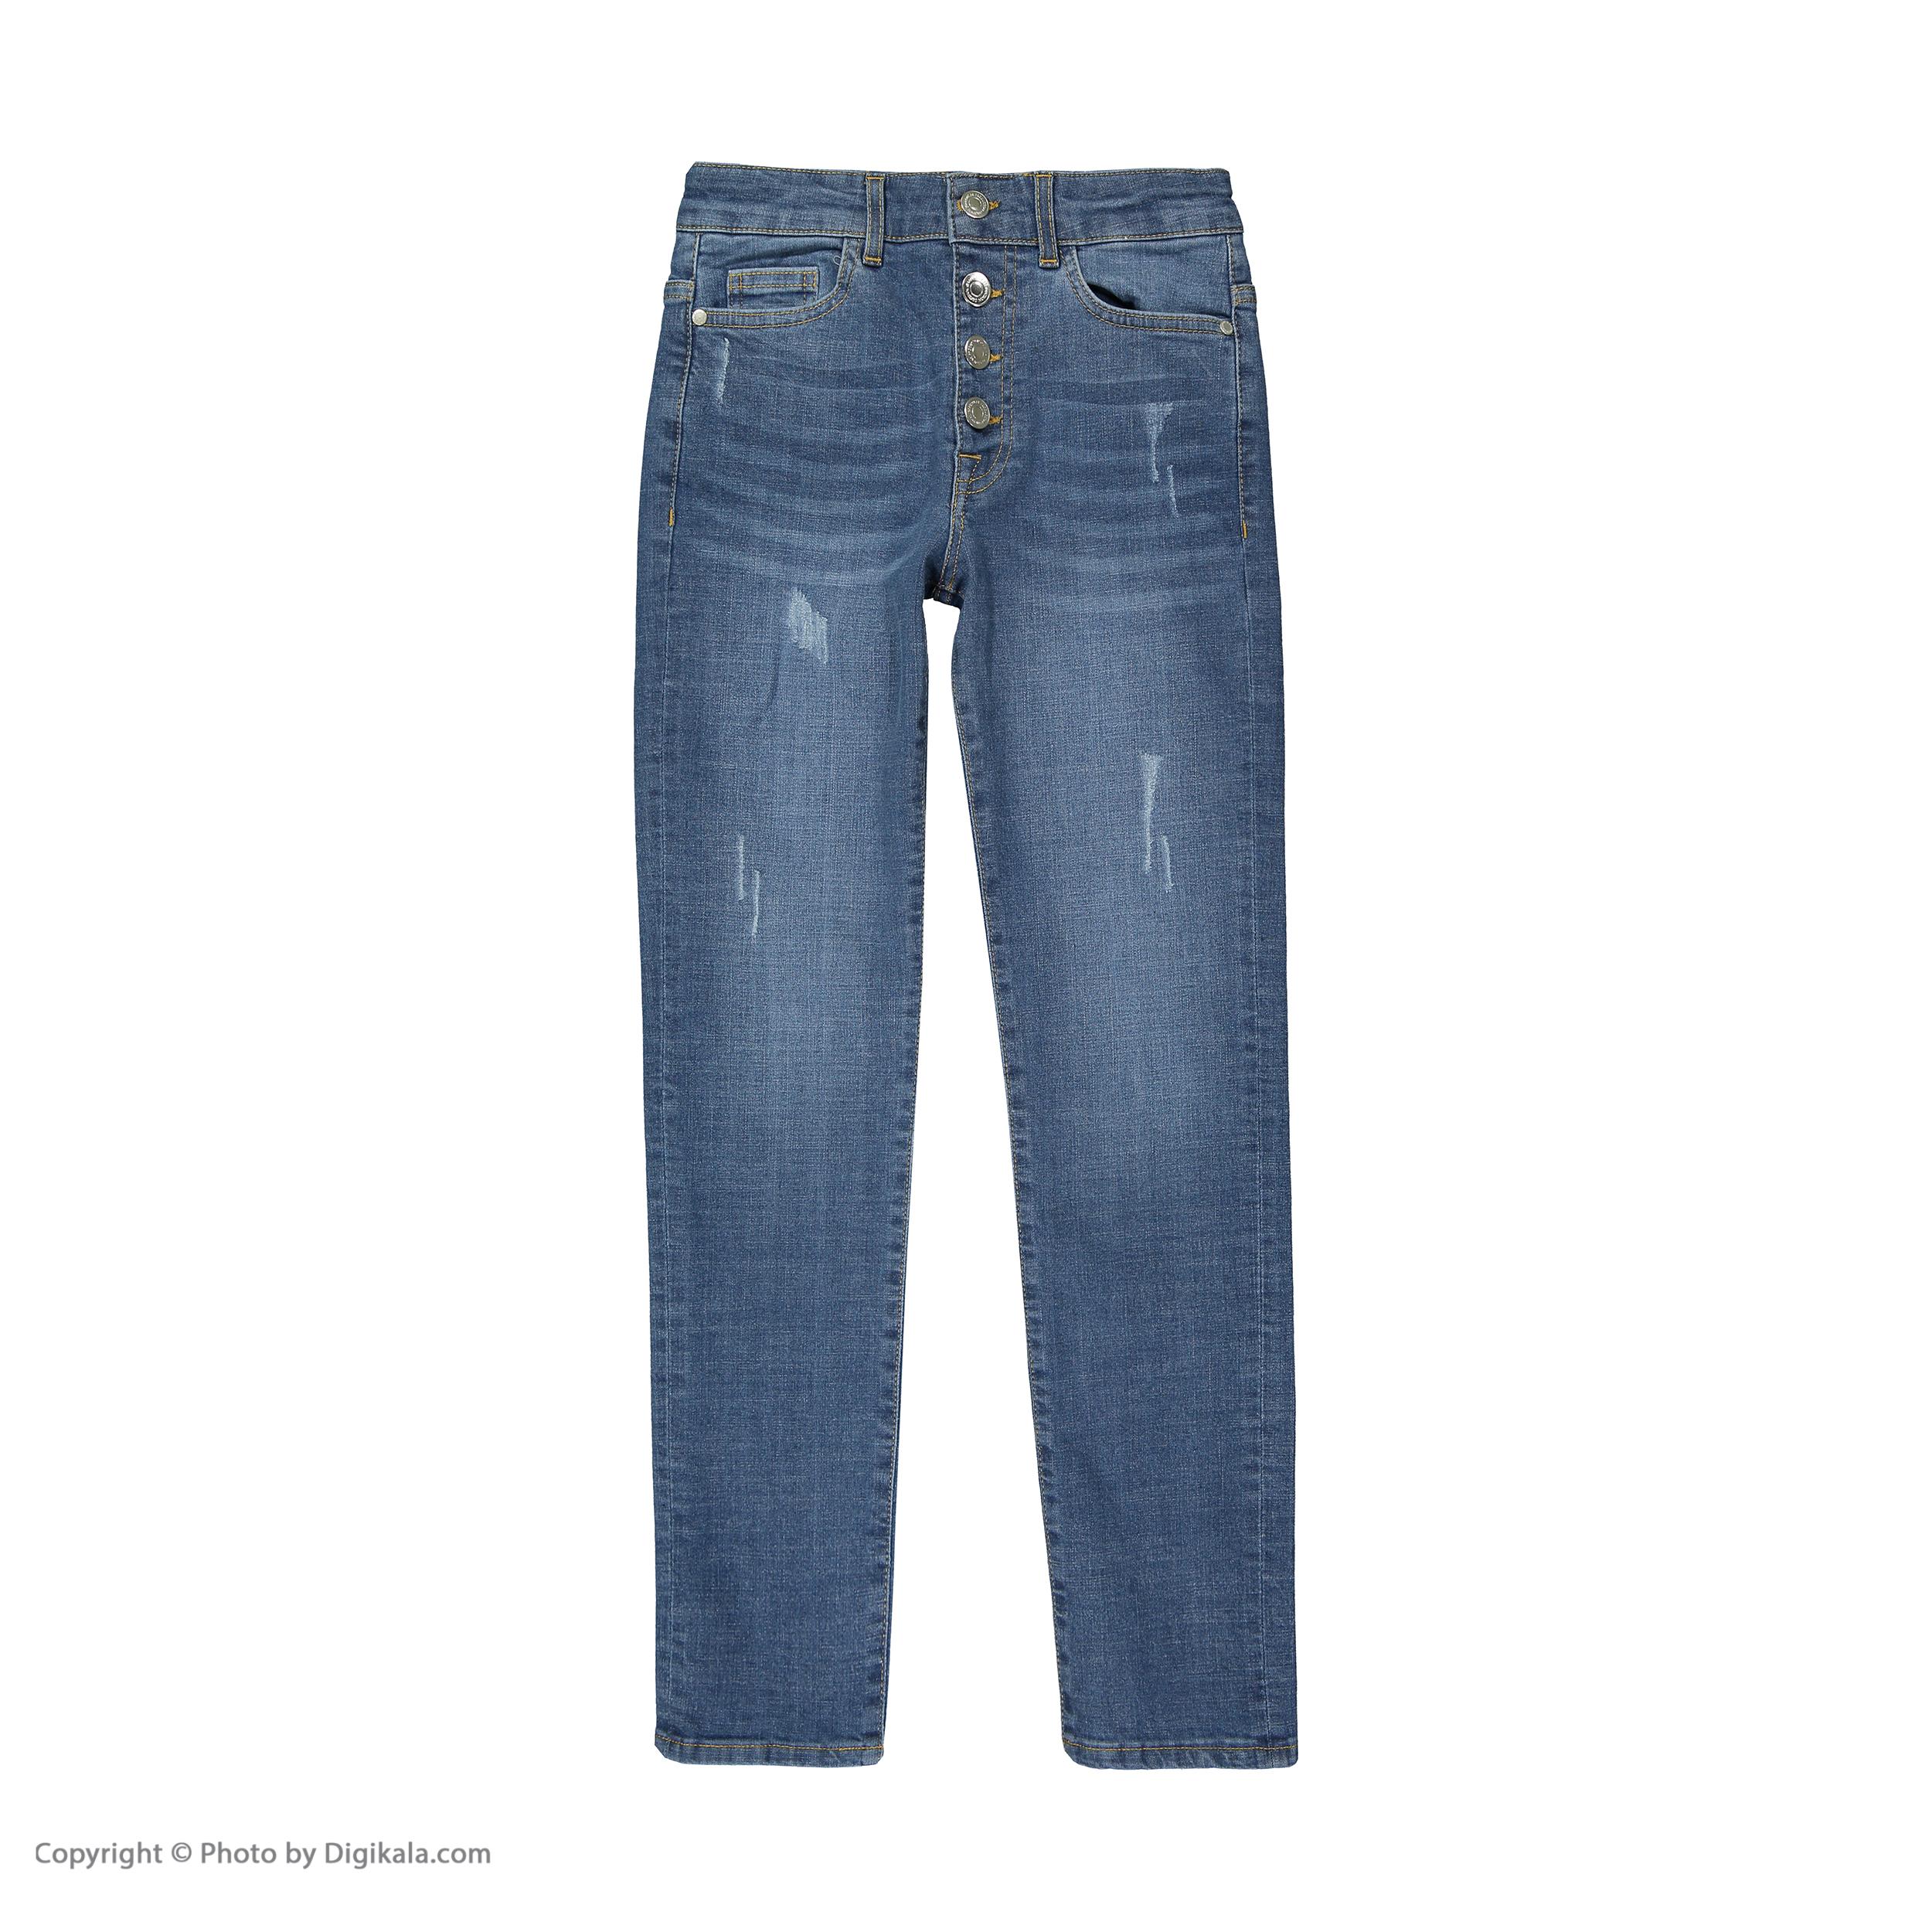 شلوار جین زنانه آر ان اس مدل 1104075-59 -  - 2